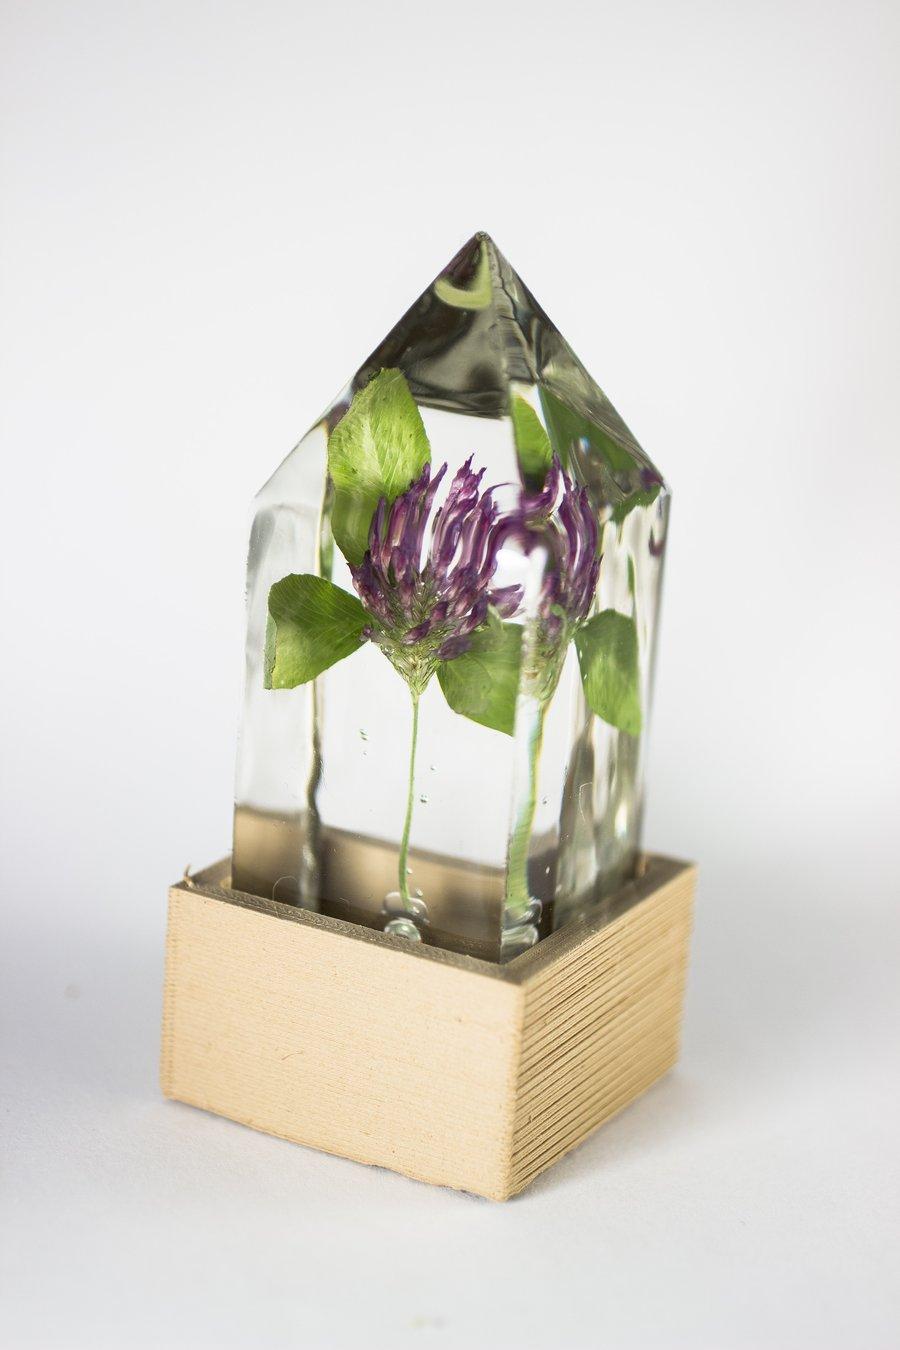 Image of Red Clover (Trifolium pratense) - Floral Prism Light #3